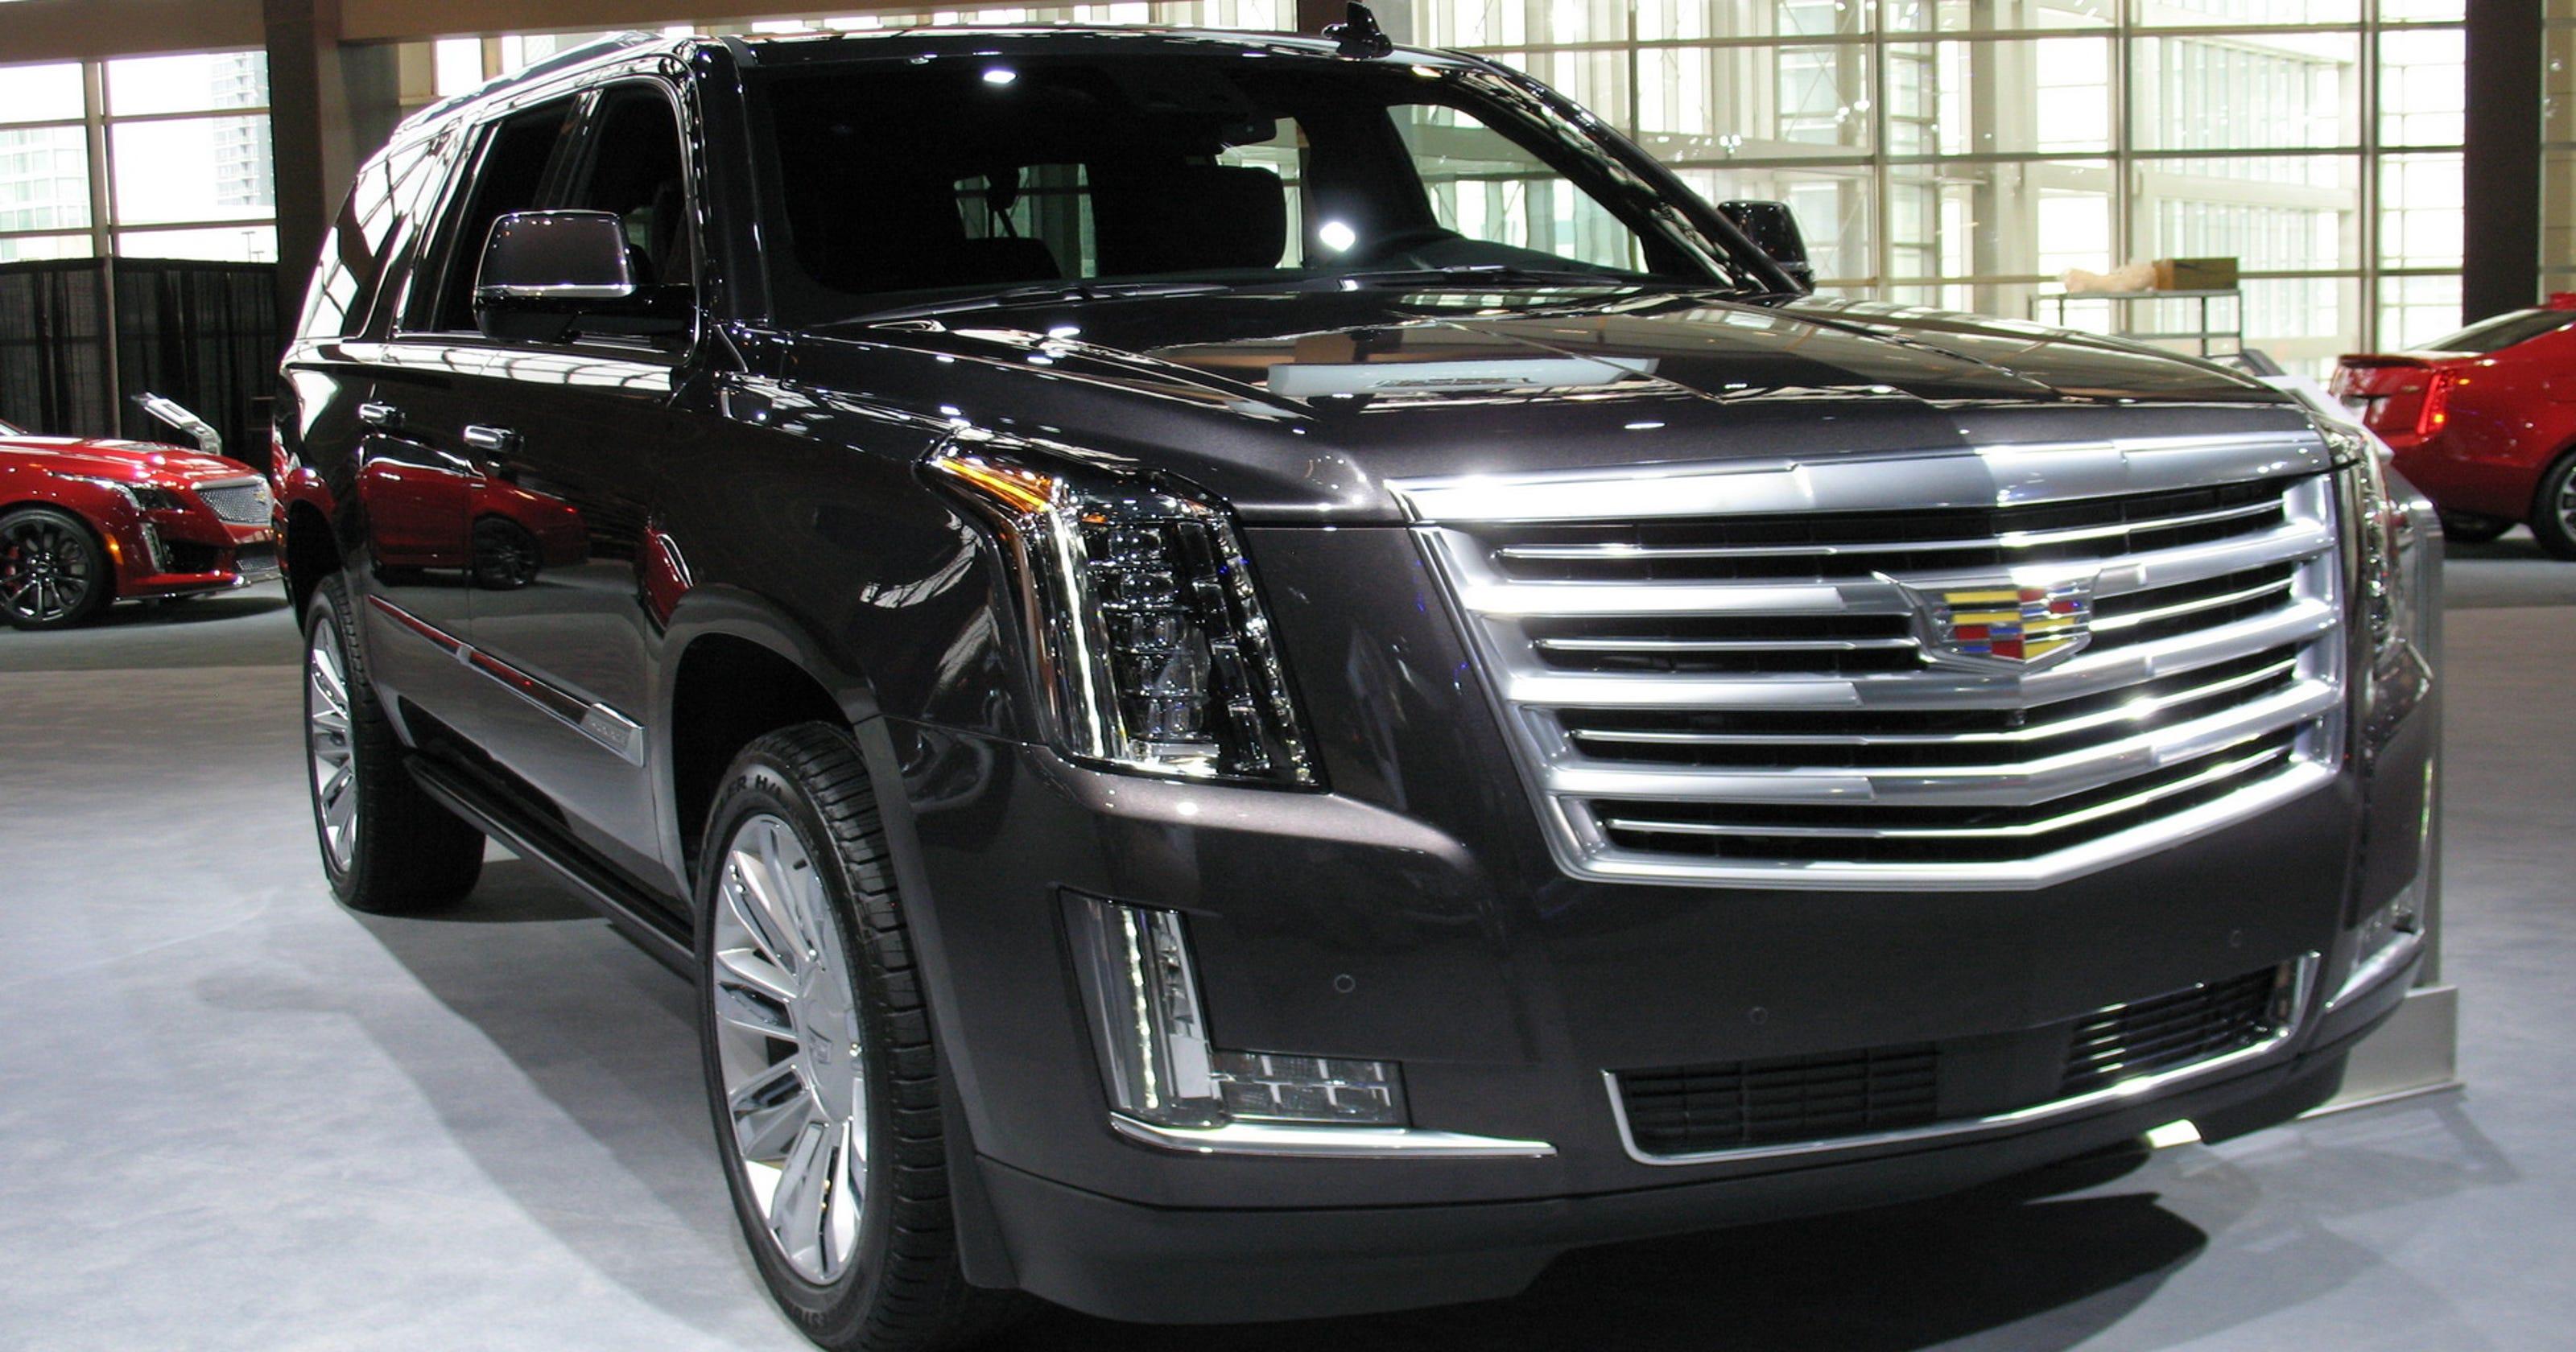 2017 Cadillac Escalade Esv Suv Shows Precise Craftsmanship 200